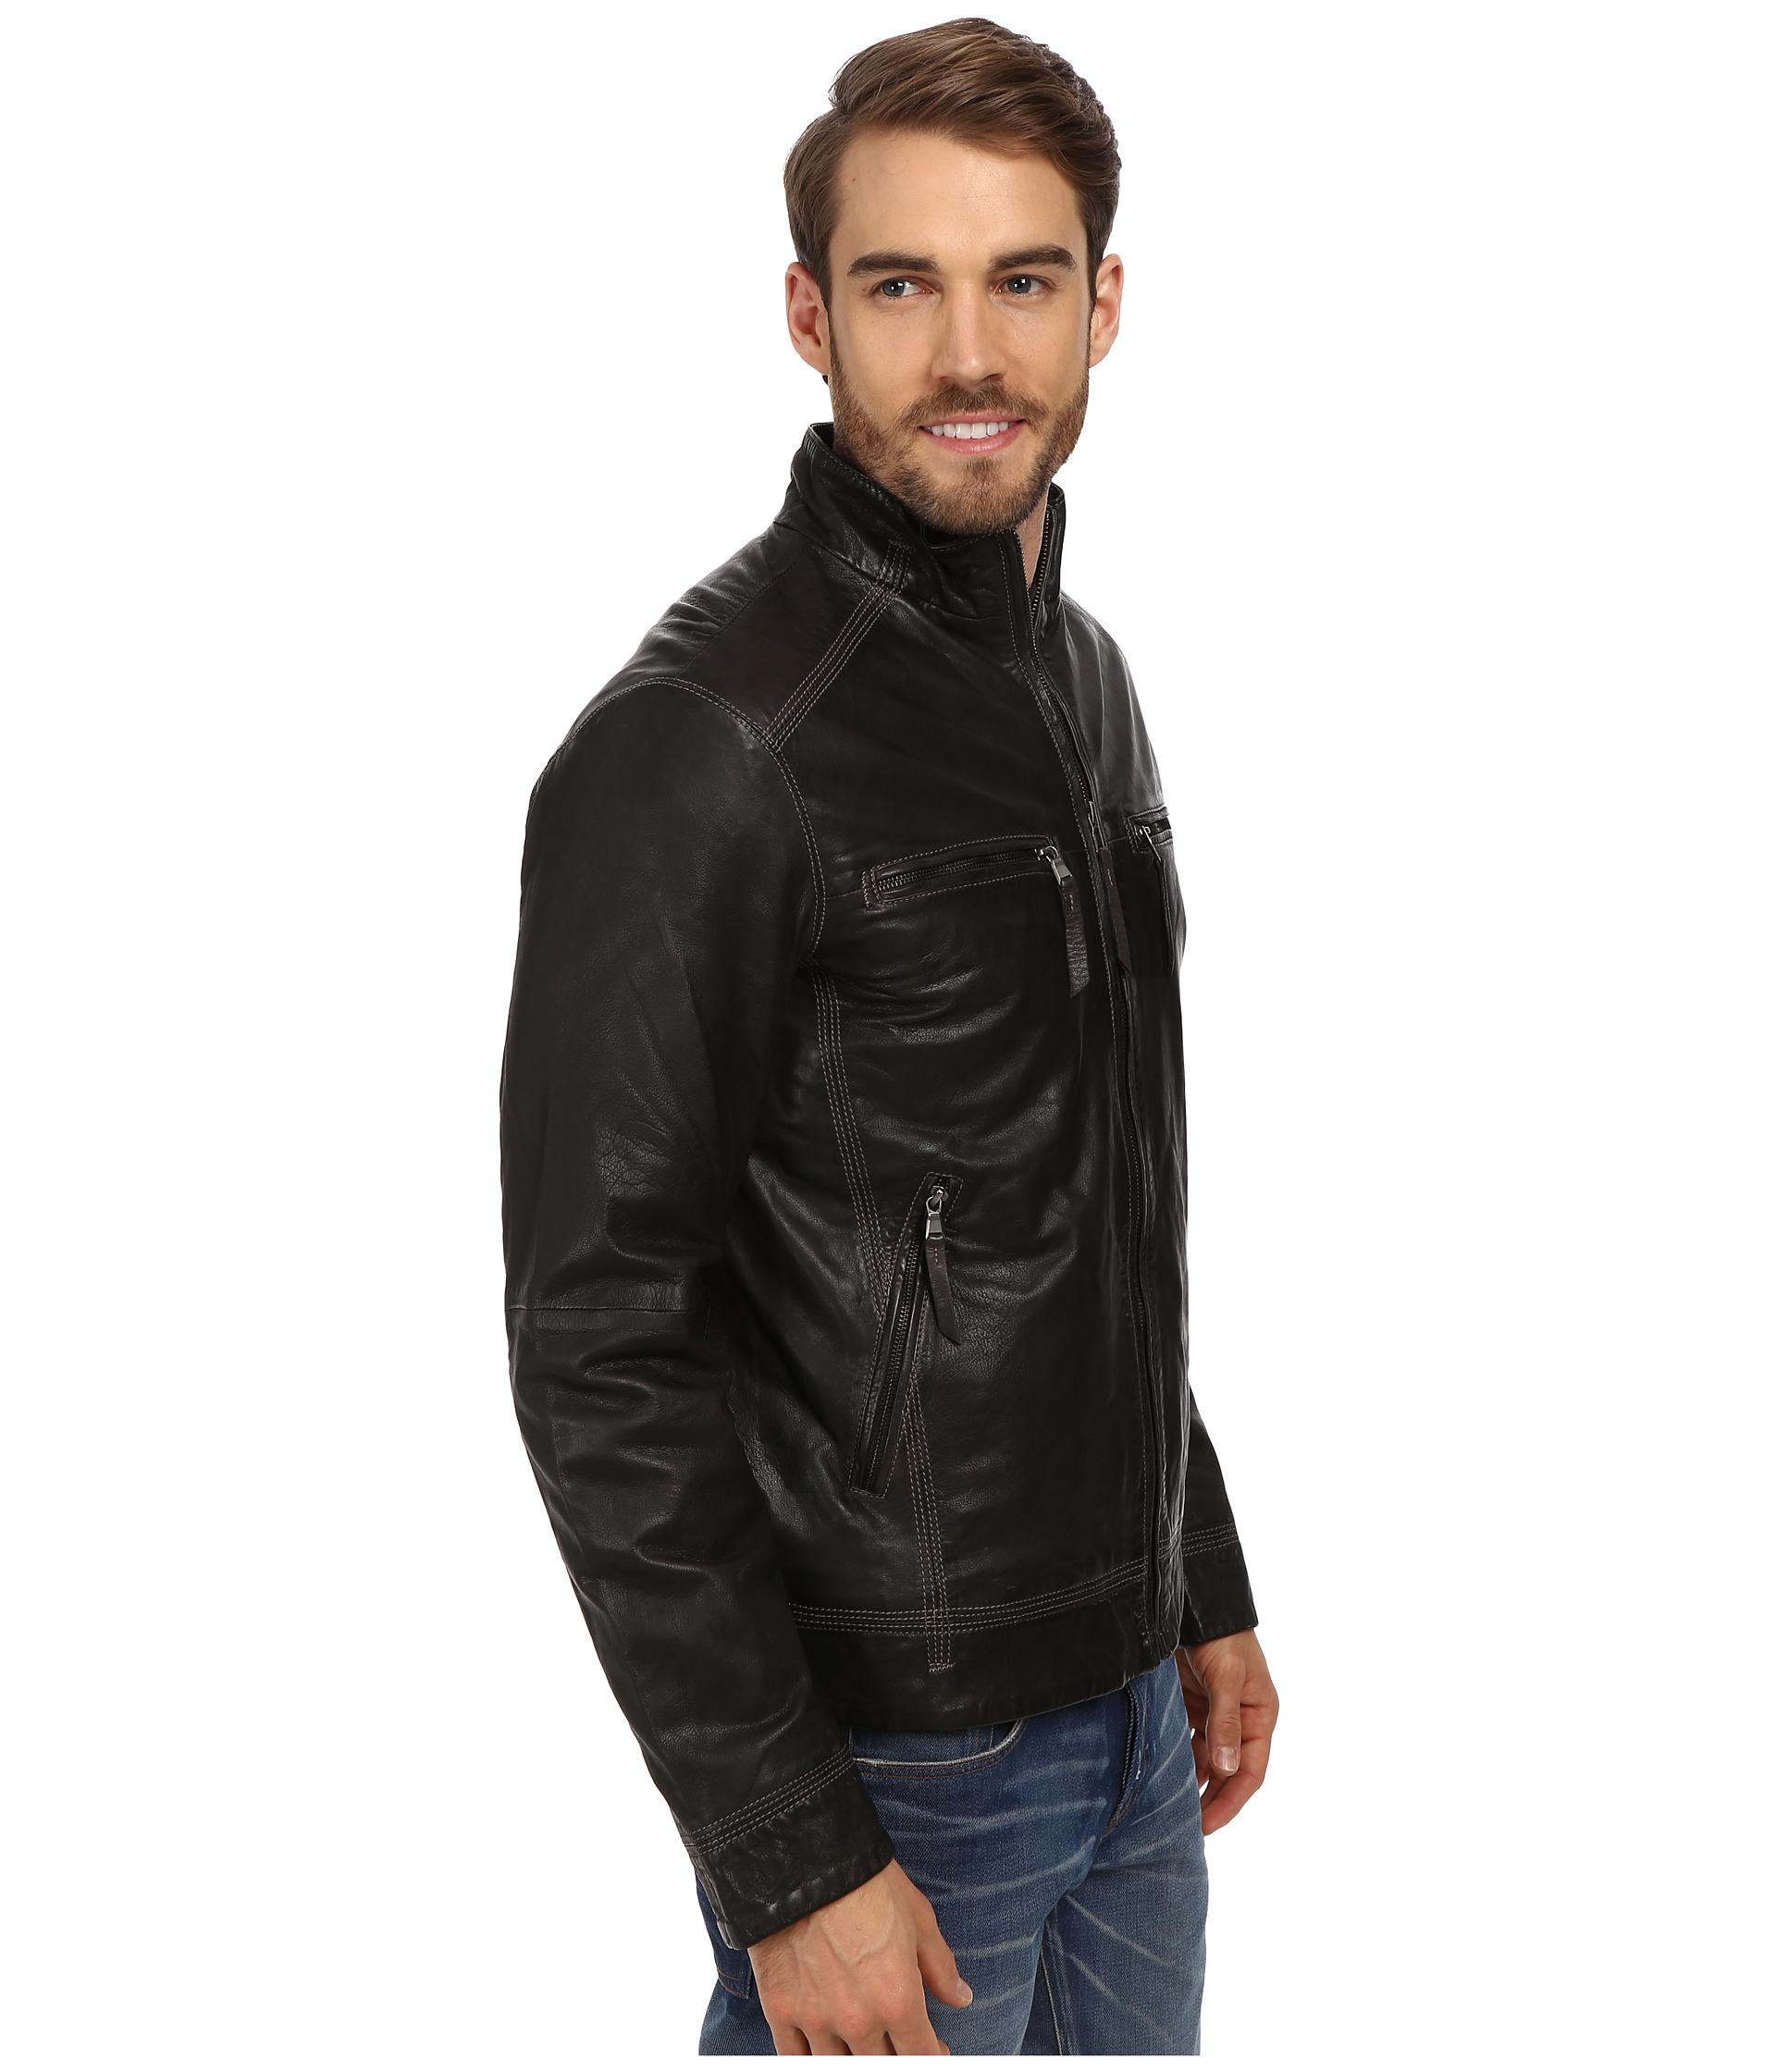 Stetson leather jacket